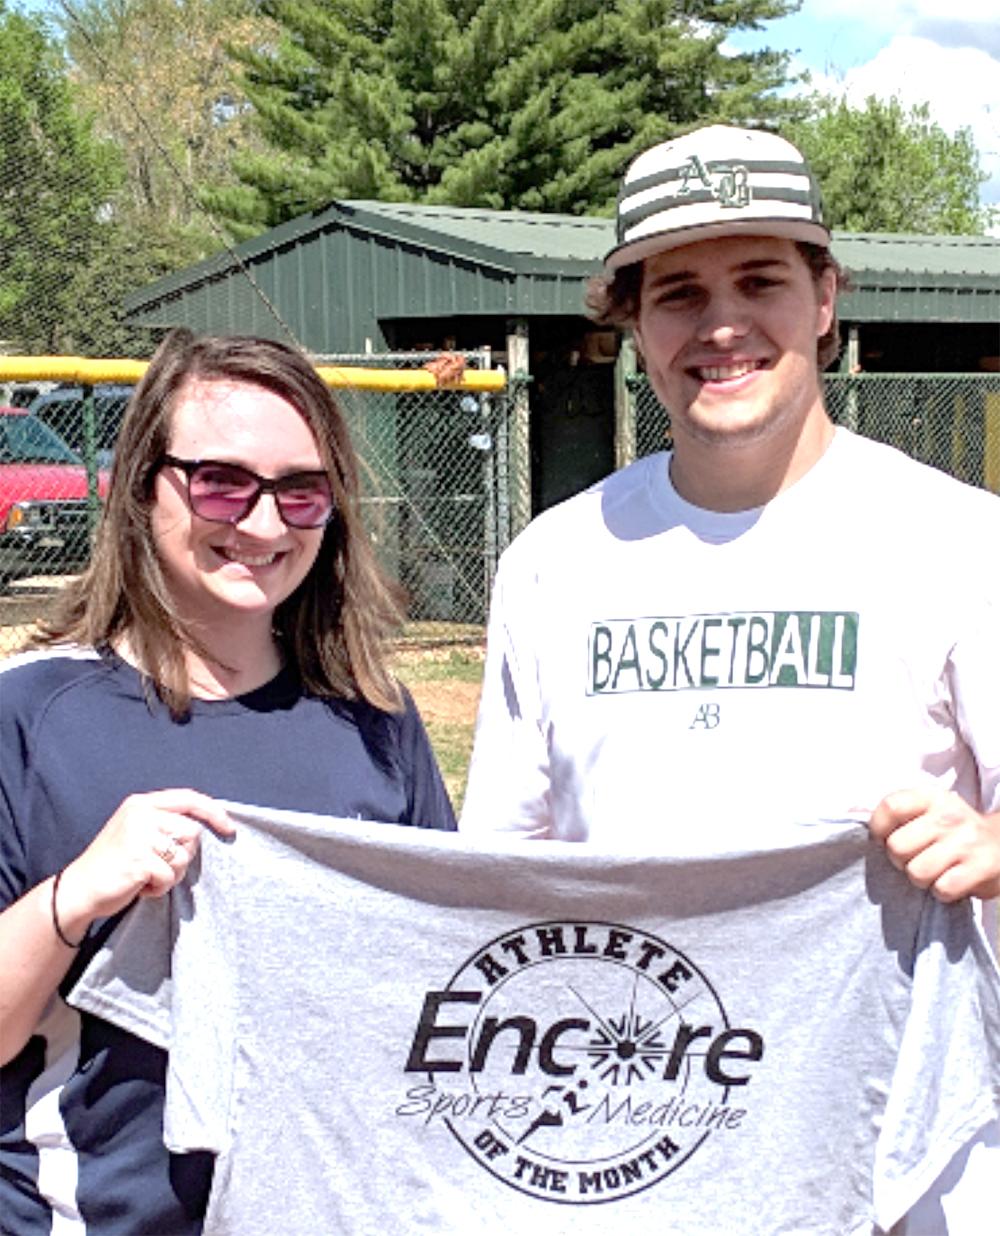 Encore Rehabilitation-Athens Athlete of the Month Cade Abernathy with Encore Sports Medicine Athletic Trainer Raye Anne Swift #EncoreRehab